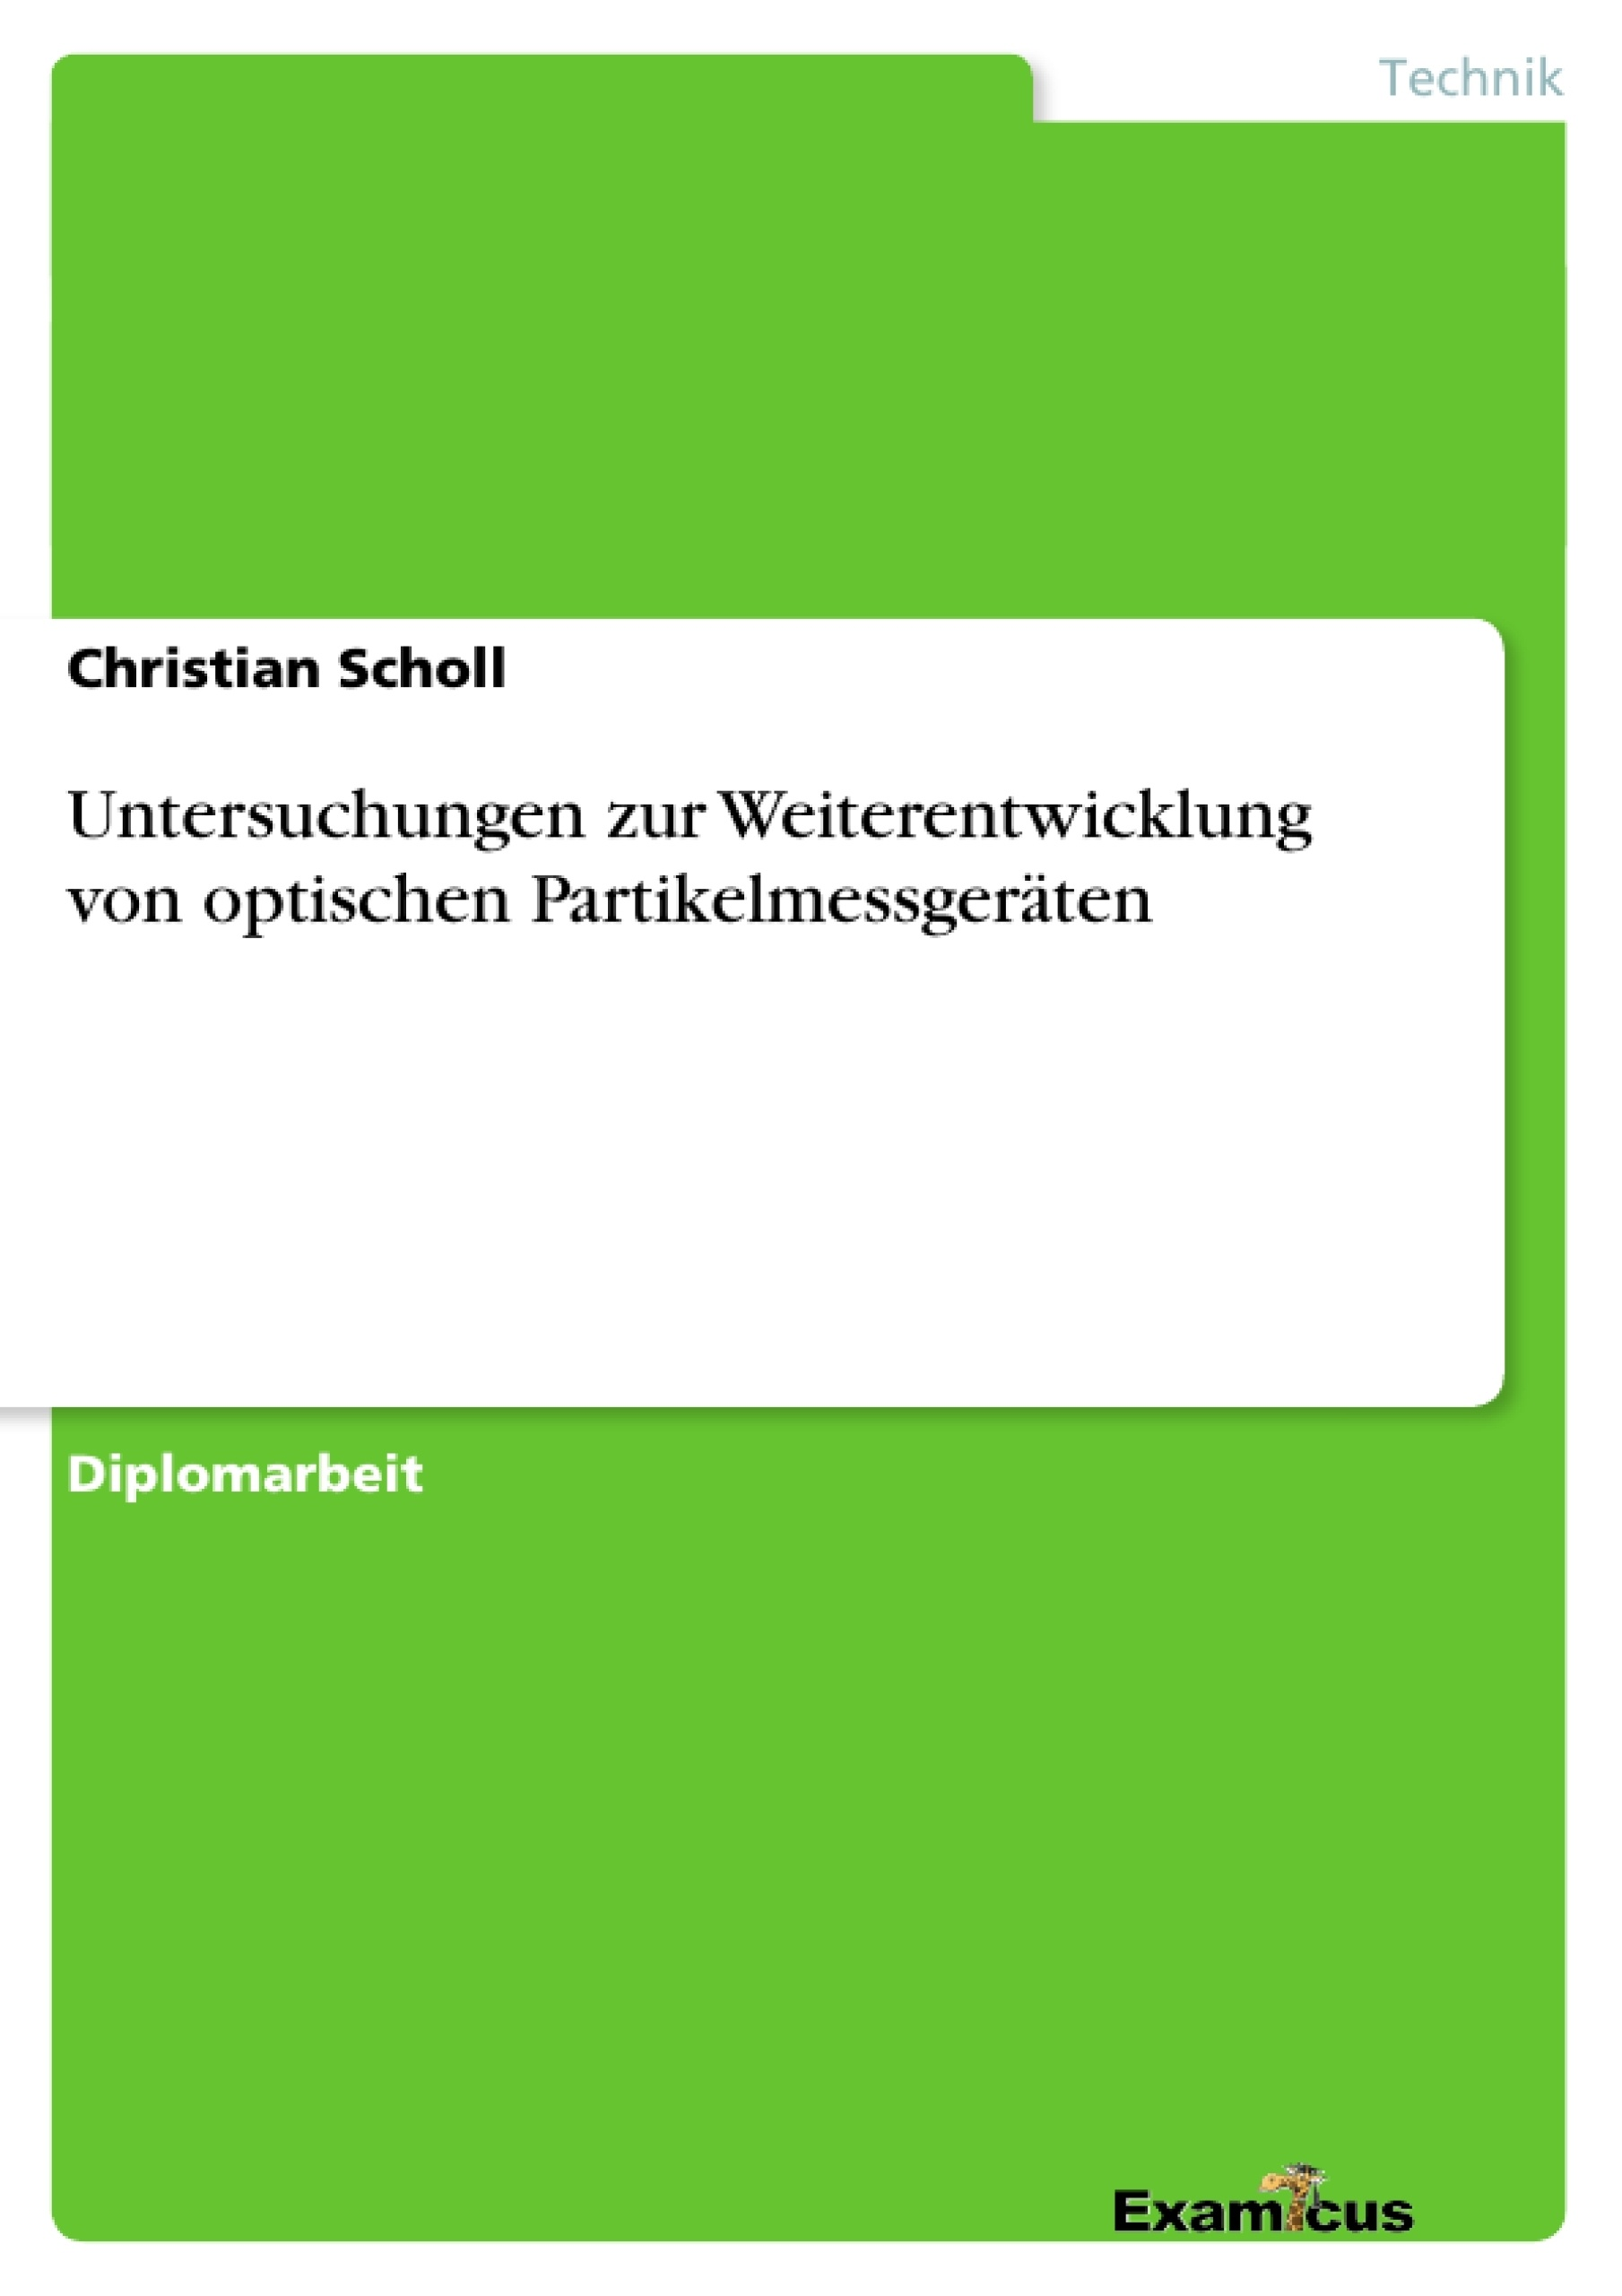 book Handbuch der Physik: Band